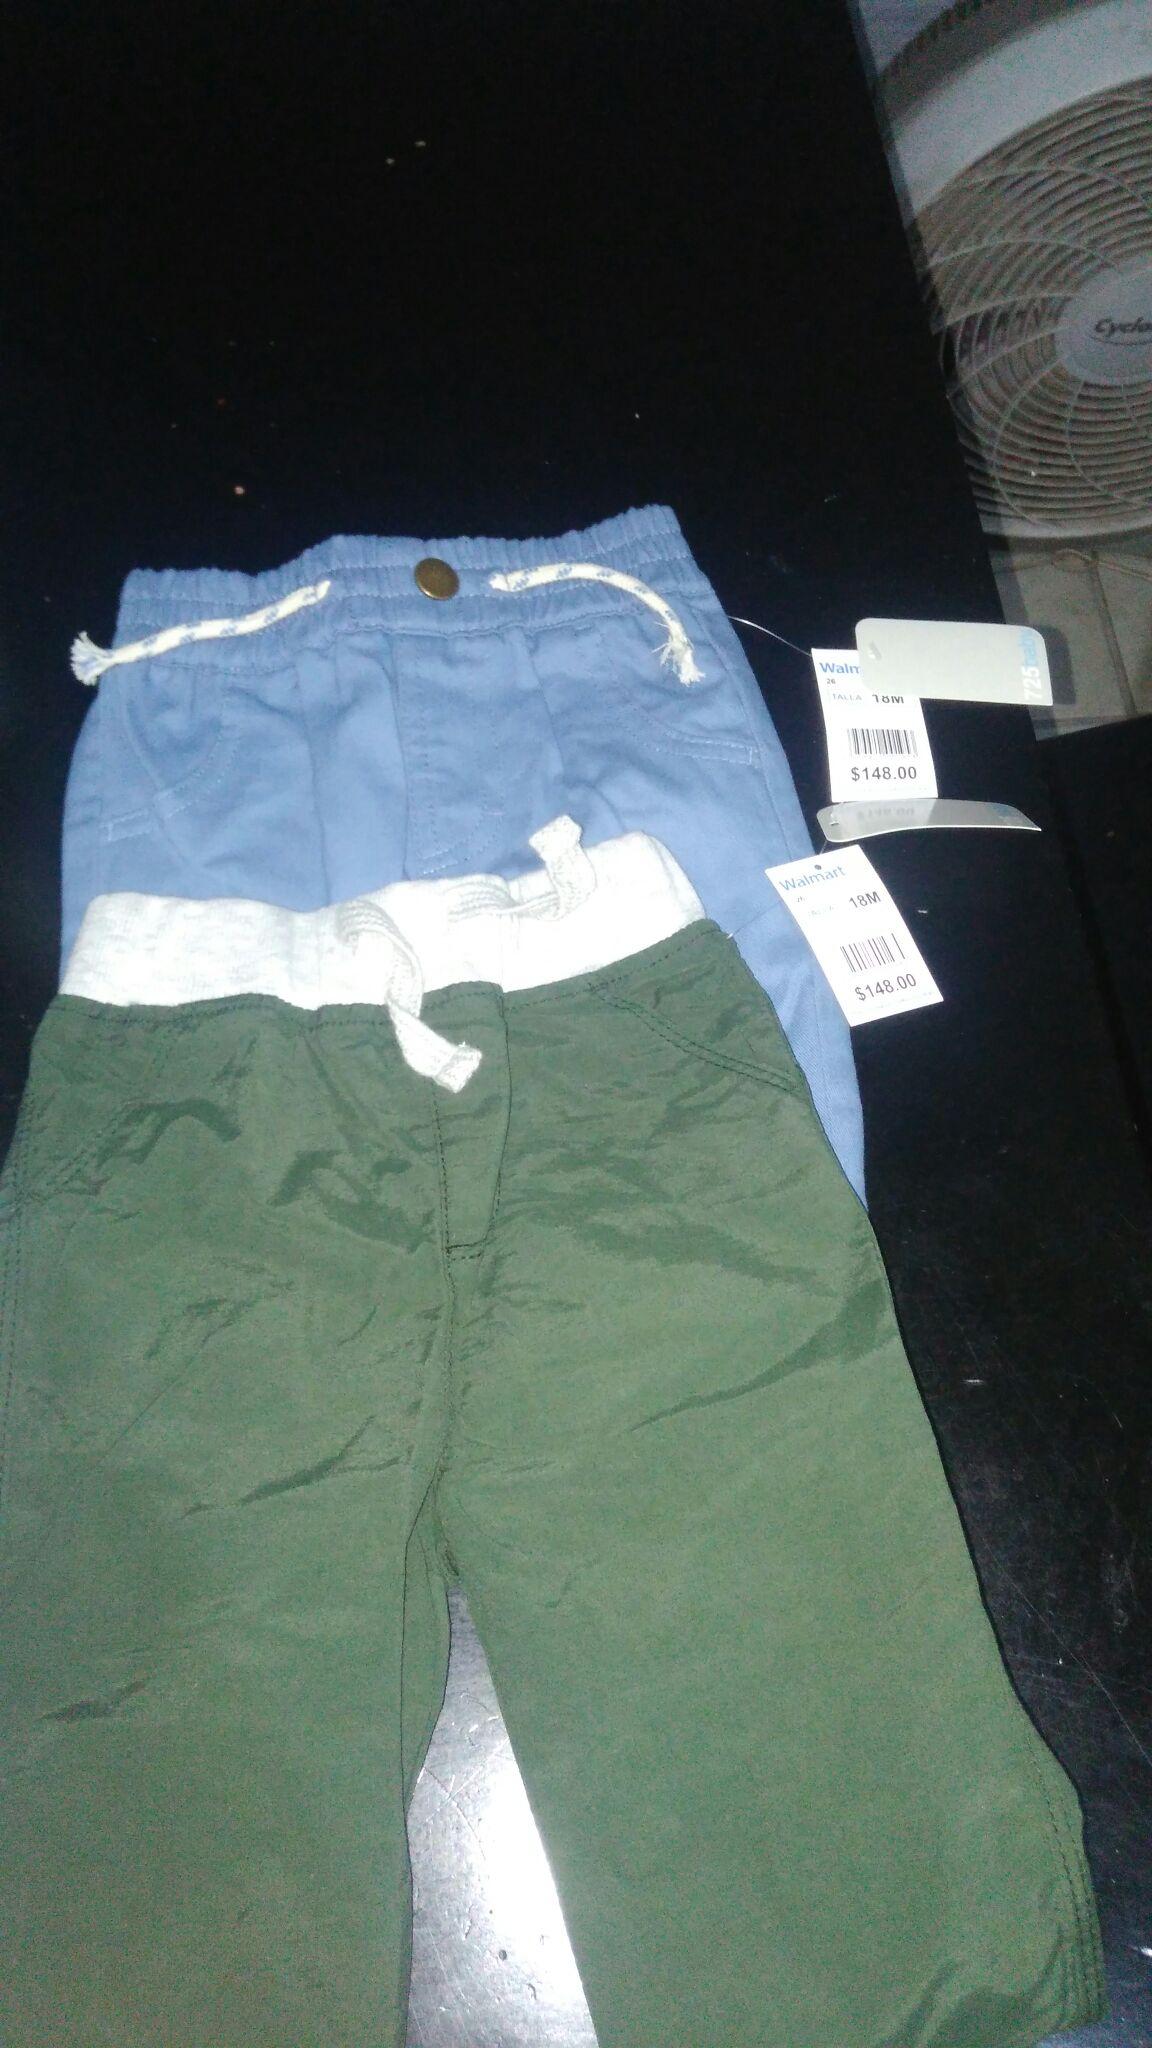 Walmart: Pantalones marca 725 baby a $20.01